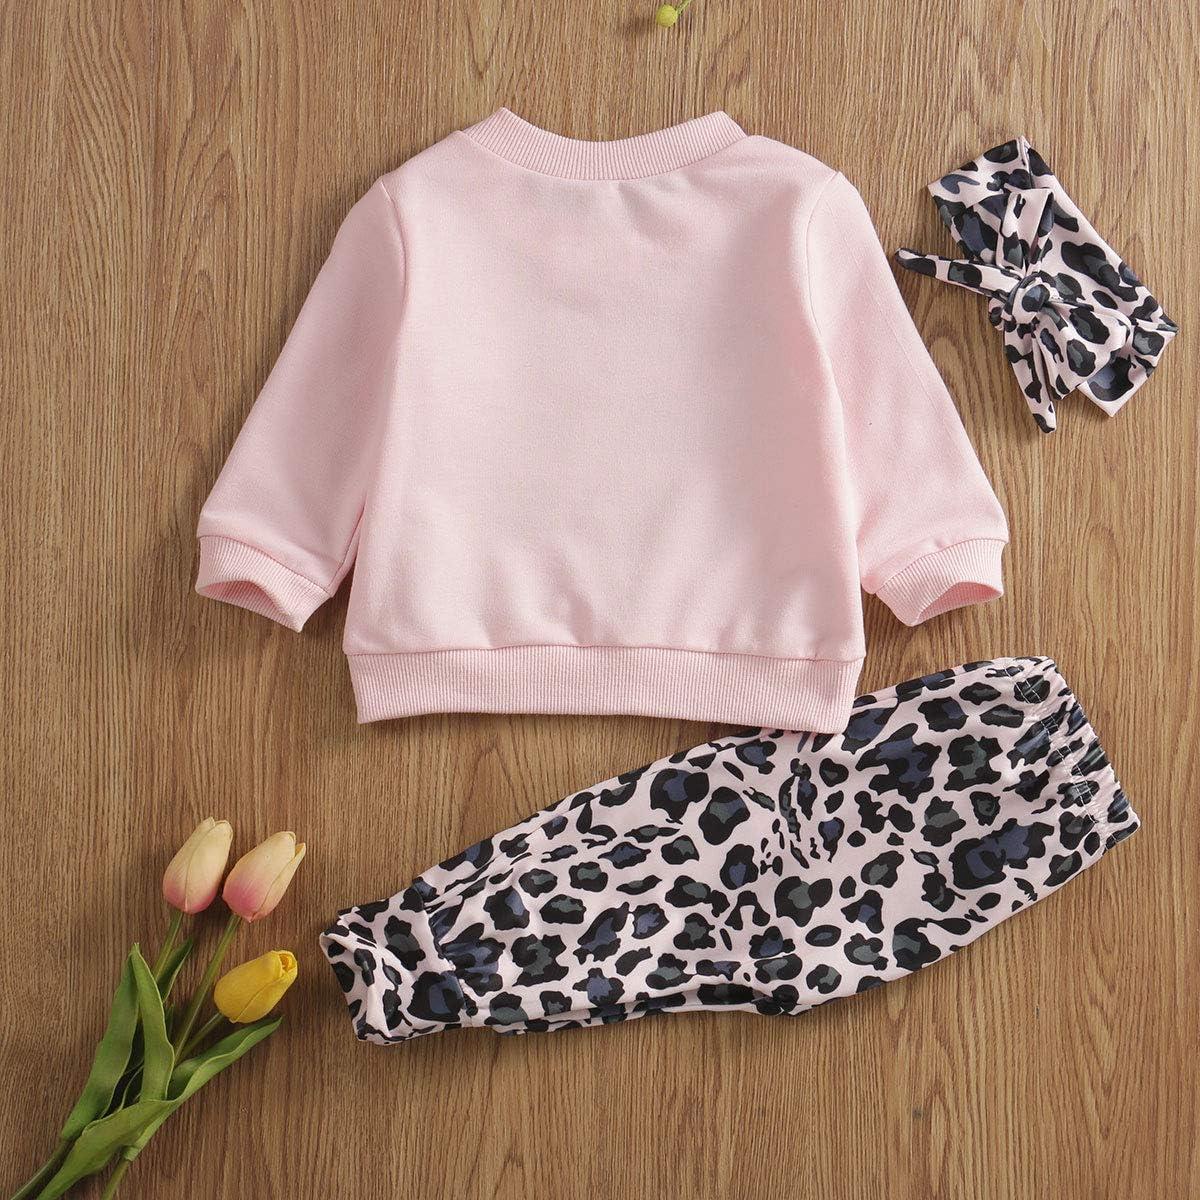 LAJIFENLEI Infant Toddler Baby Girl Long Sleeve Letter Tshirt Top+Leopard Pants+Headband Sweatshirt Outfit ClothesSet